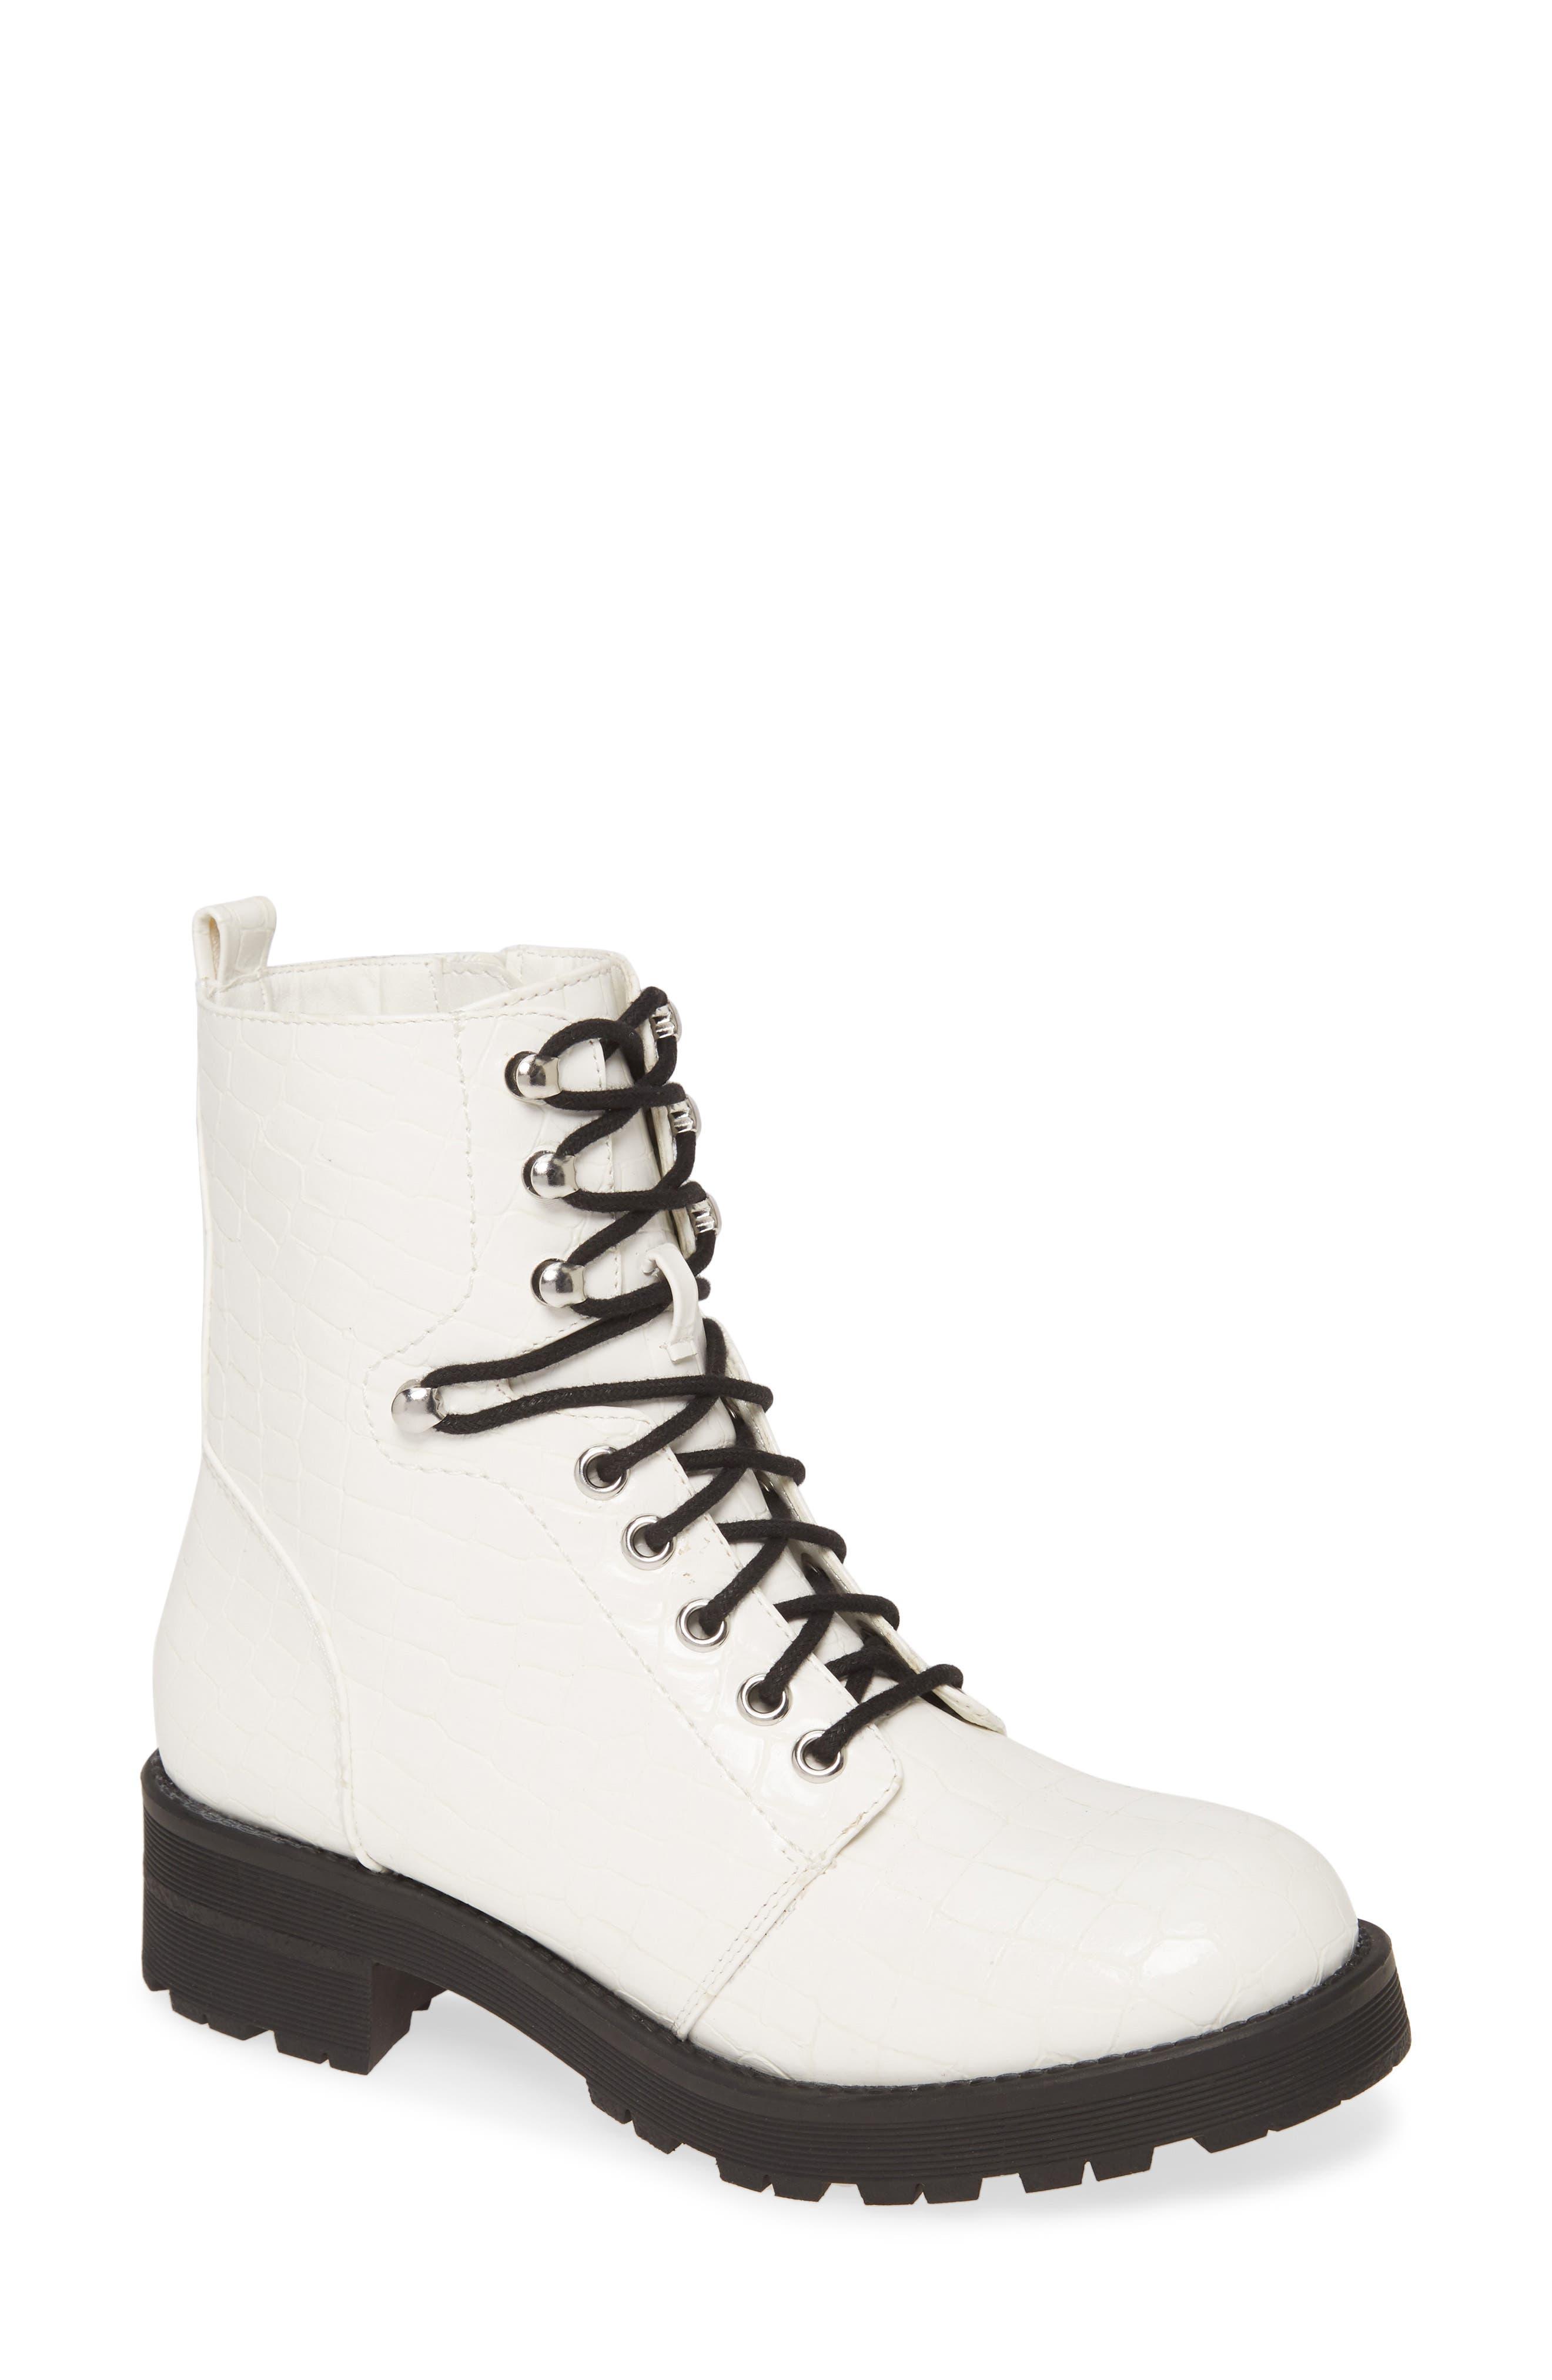 UPC 742282532588 product image for Women's Mia Indigo Boot, Size 6.5 M - White | upcitemdb.com